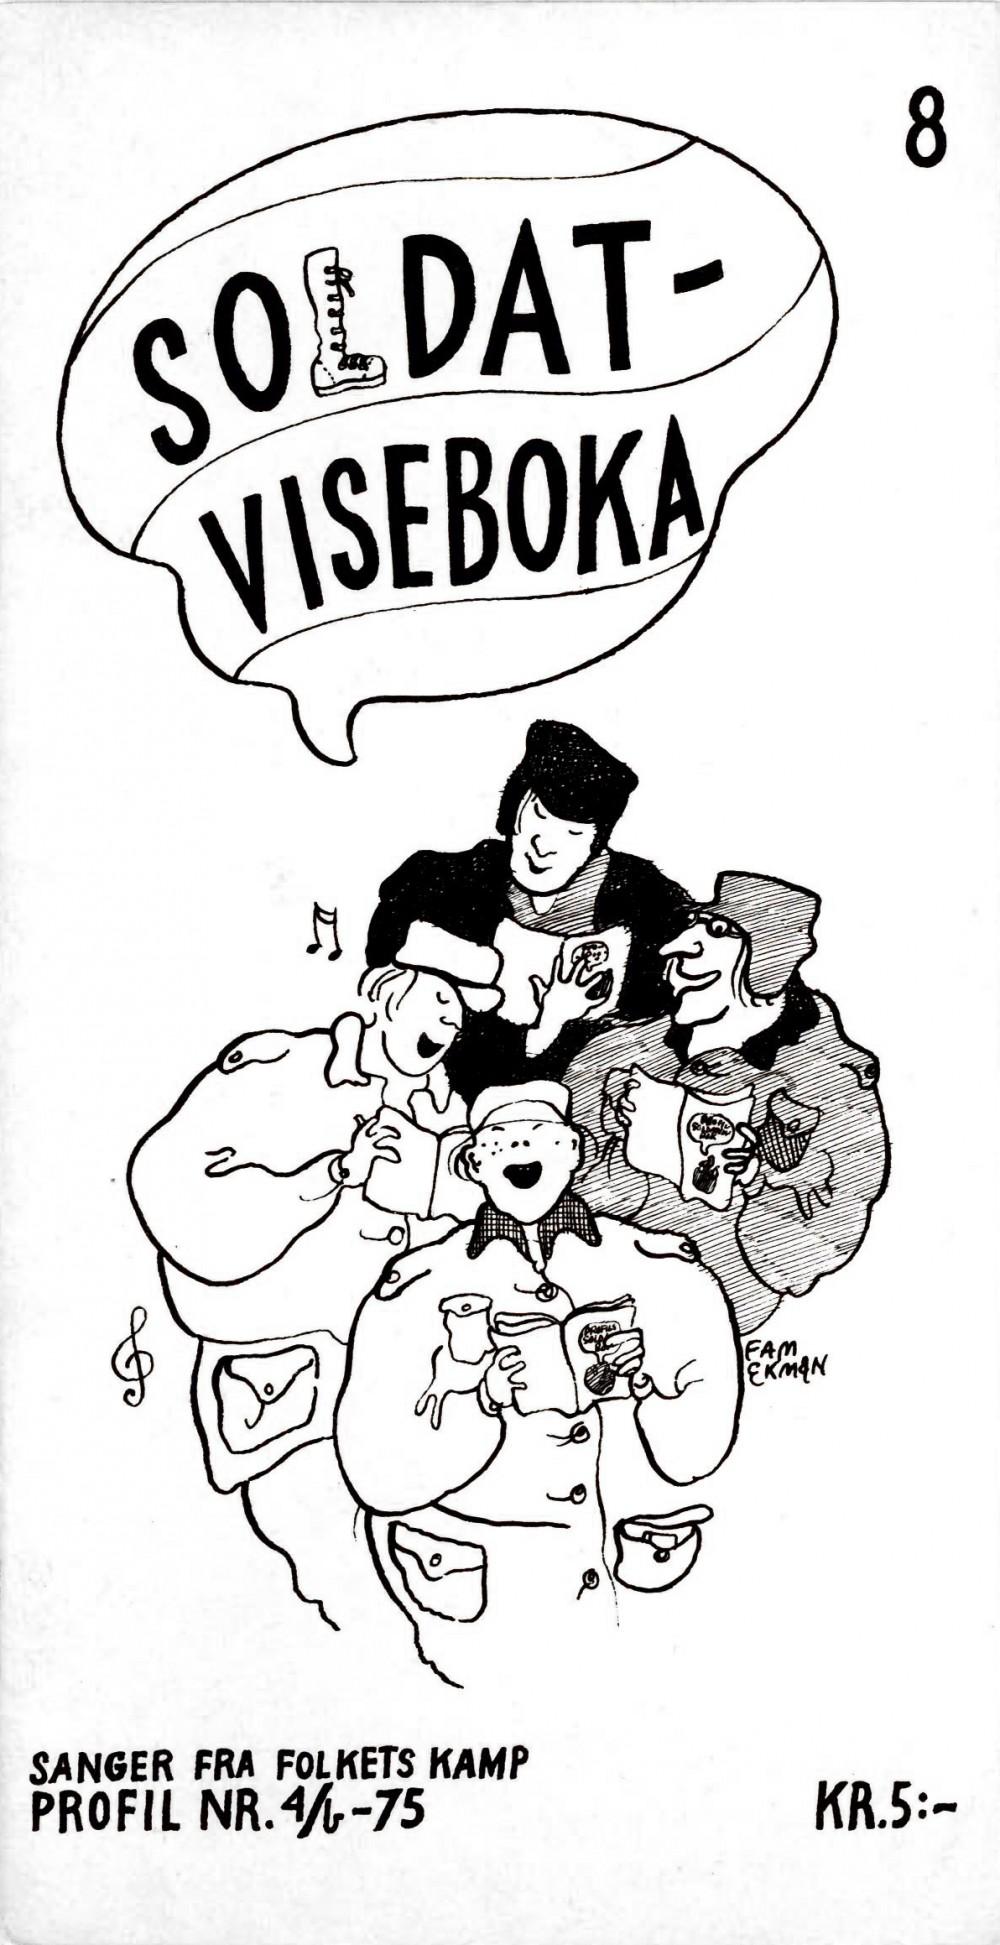 Soldat-viseboka - Sanger fra folkets kamp - Profil nr 4b 1975